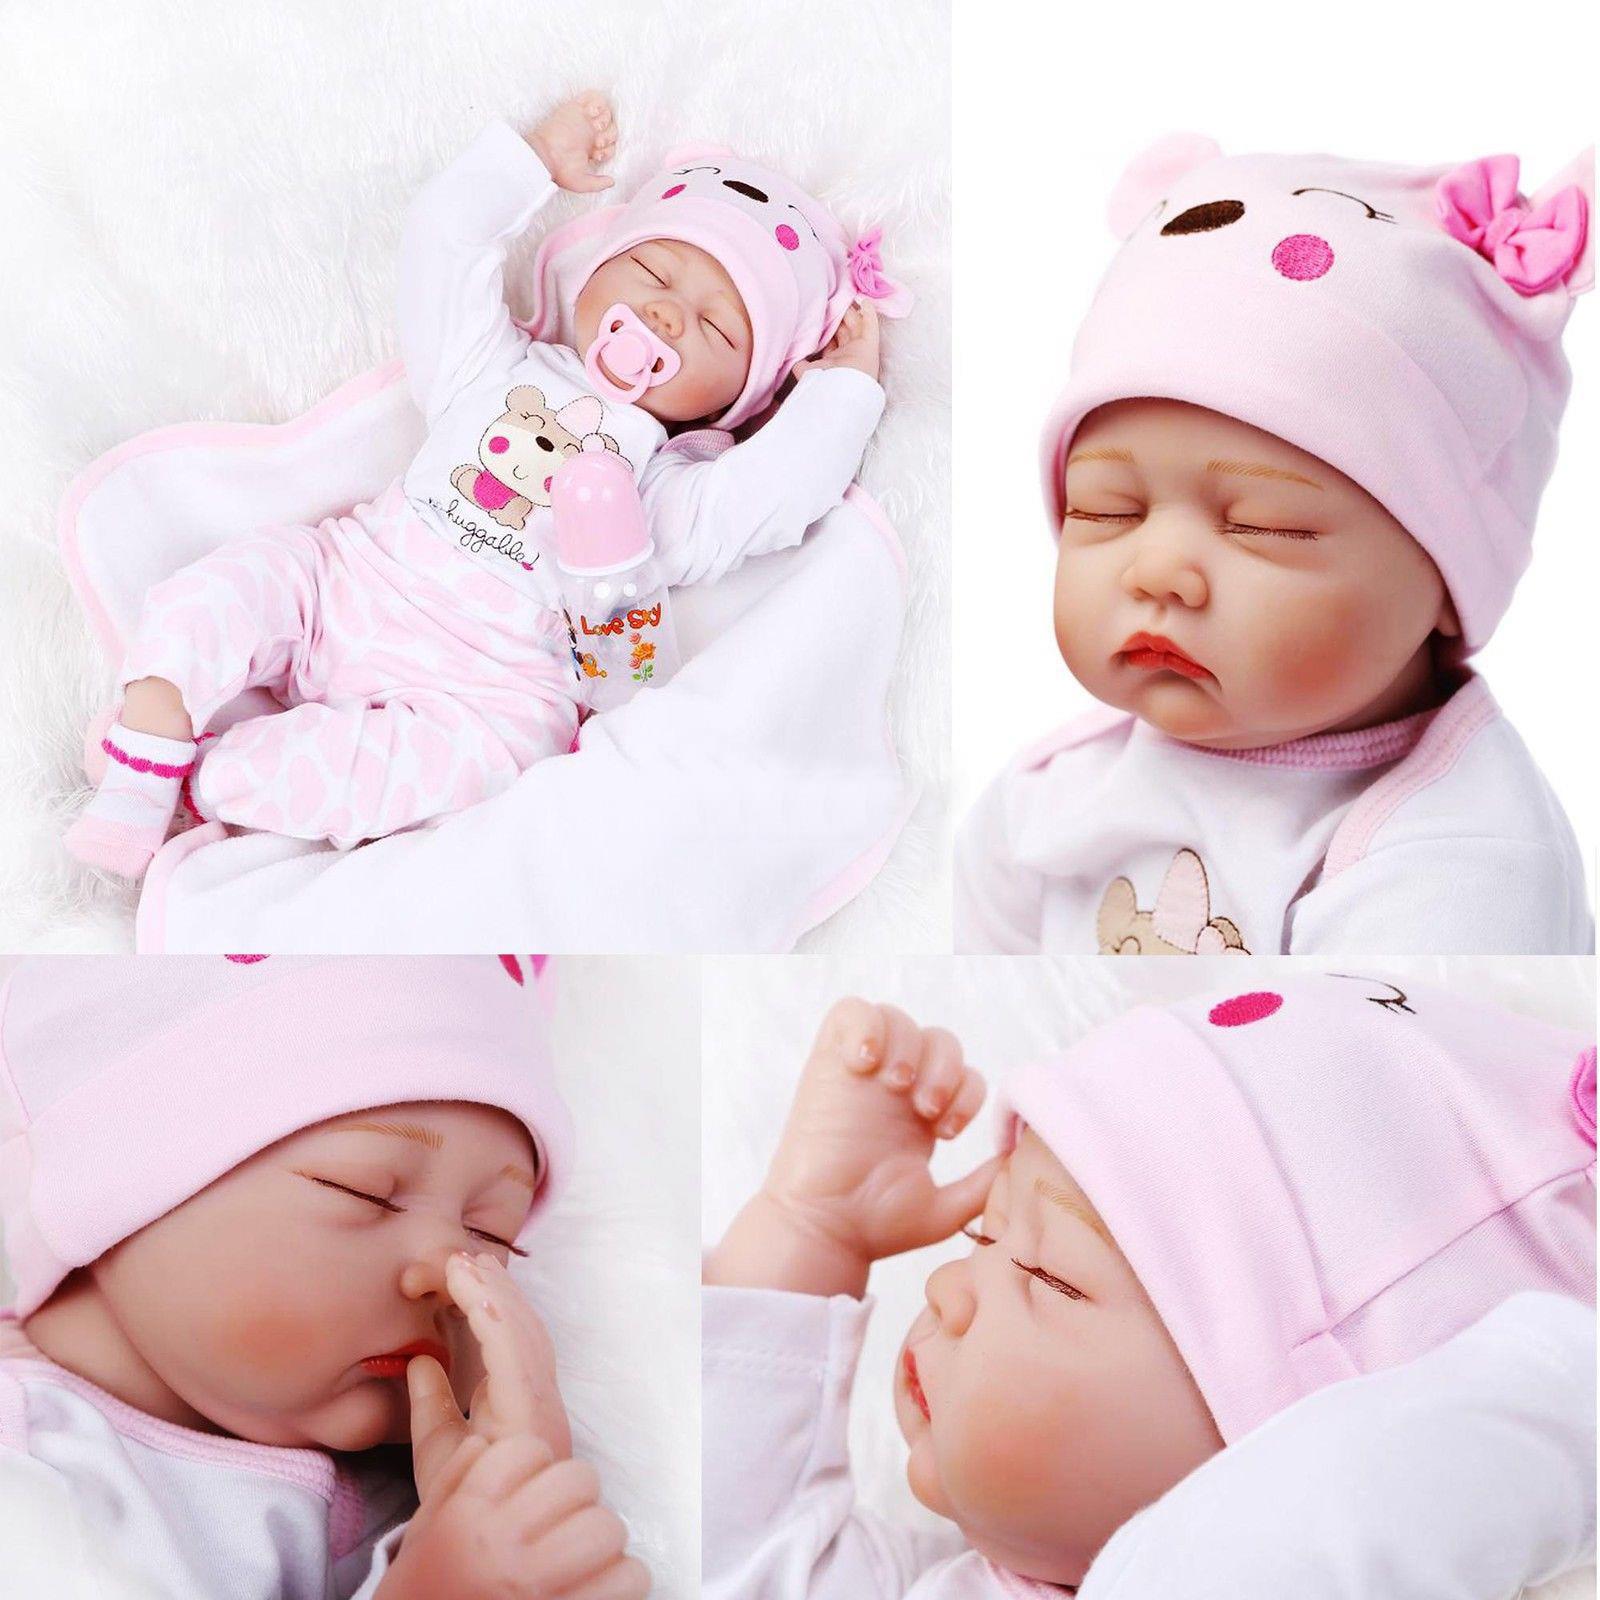 Soft Reborn Toddlers Girl 22inch Silicone Realistic Baby Dolls Reborn Dolls Cute